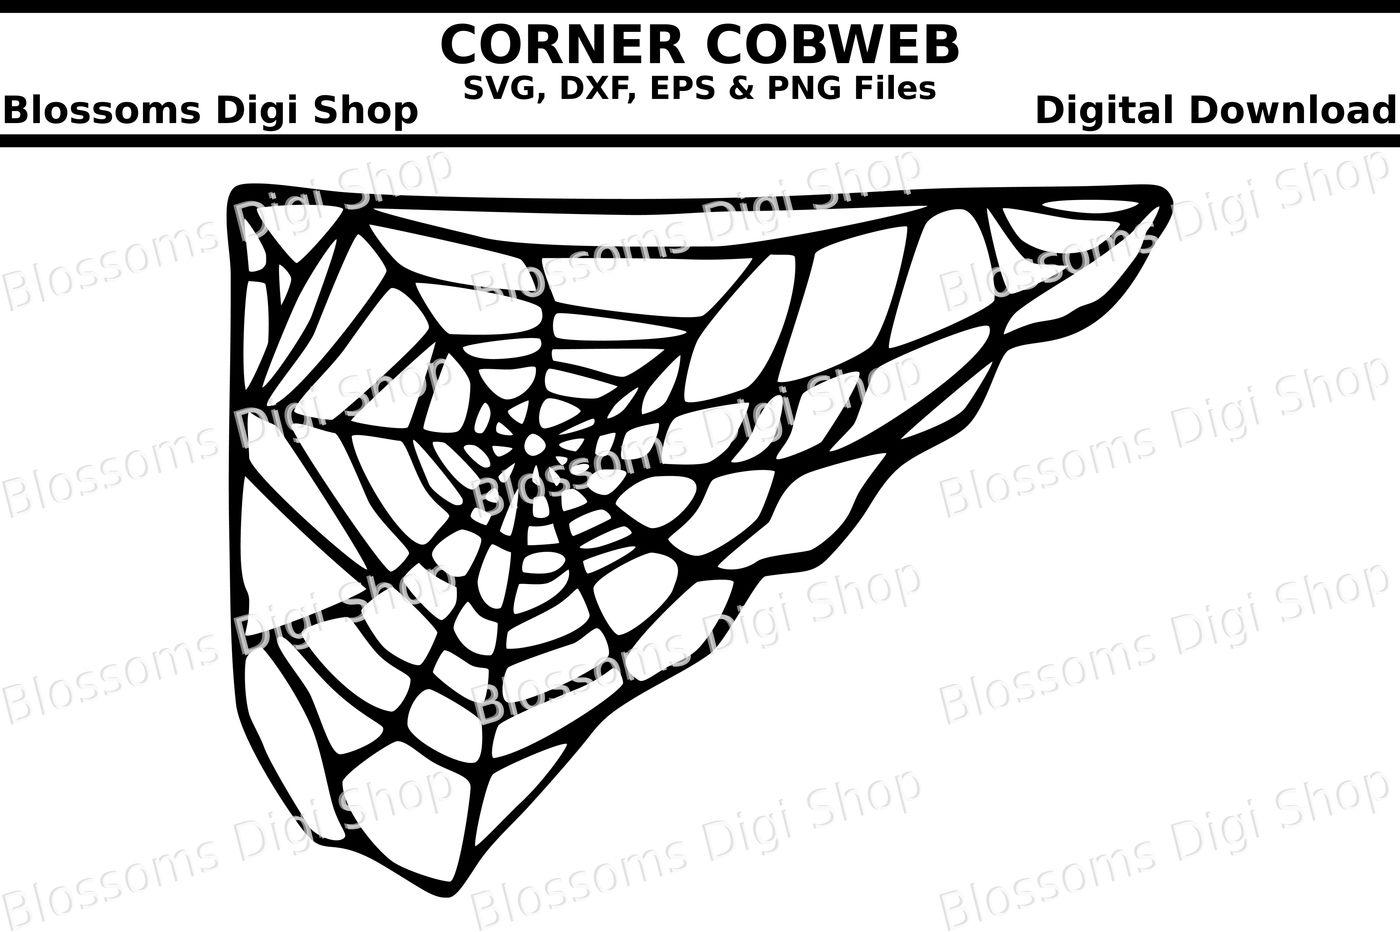 Corner Cobweb Cut File Svg Dxf Eps And Png Files By Blossoms Digi Shop Thehungryjpeg Com